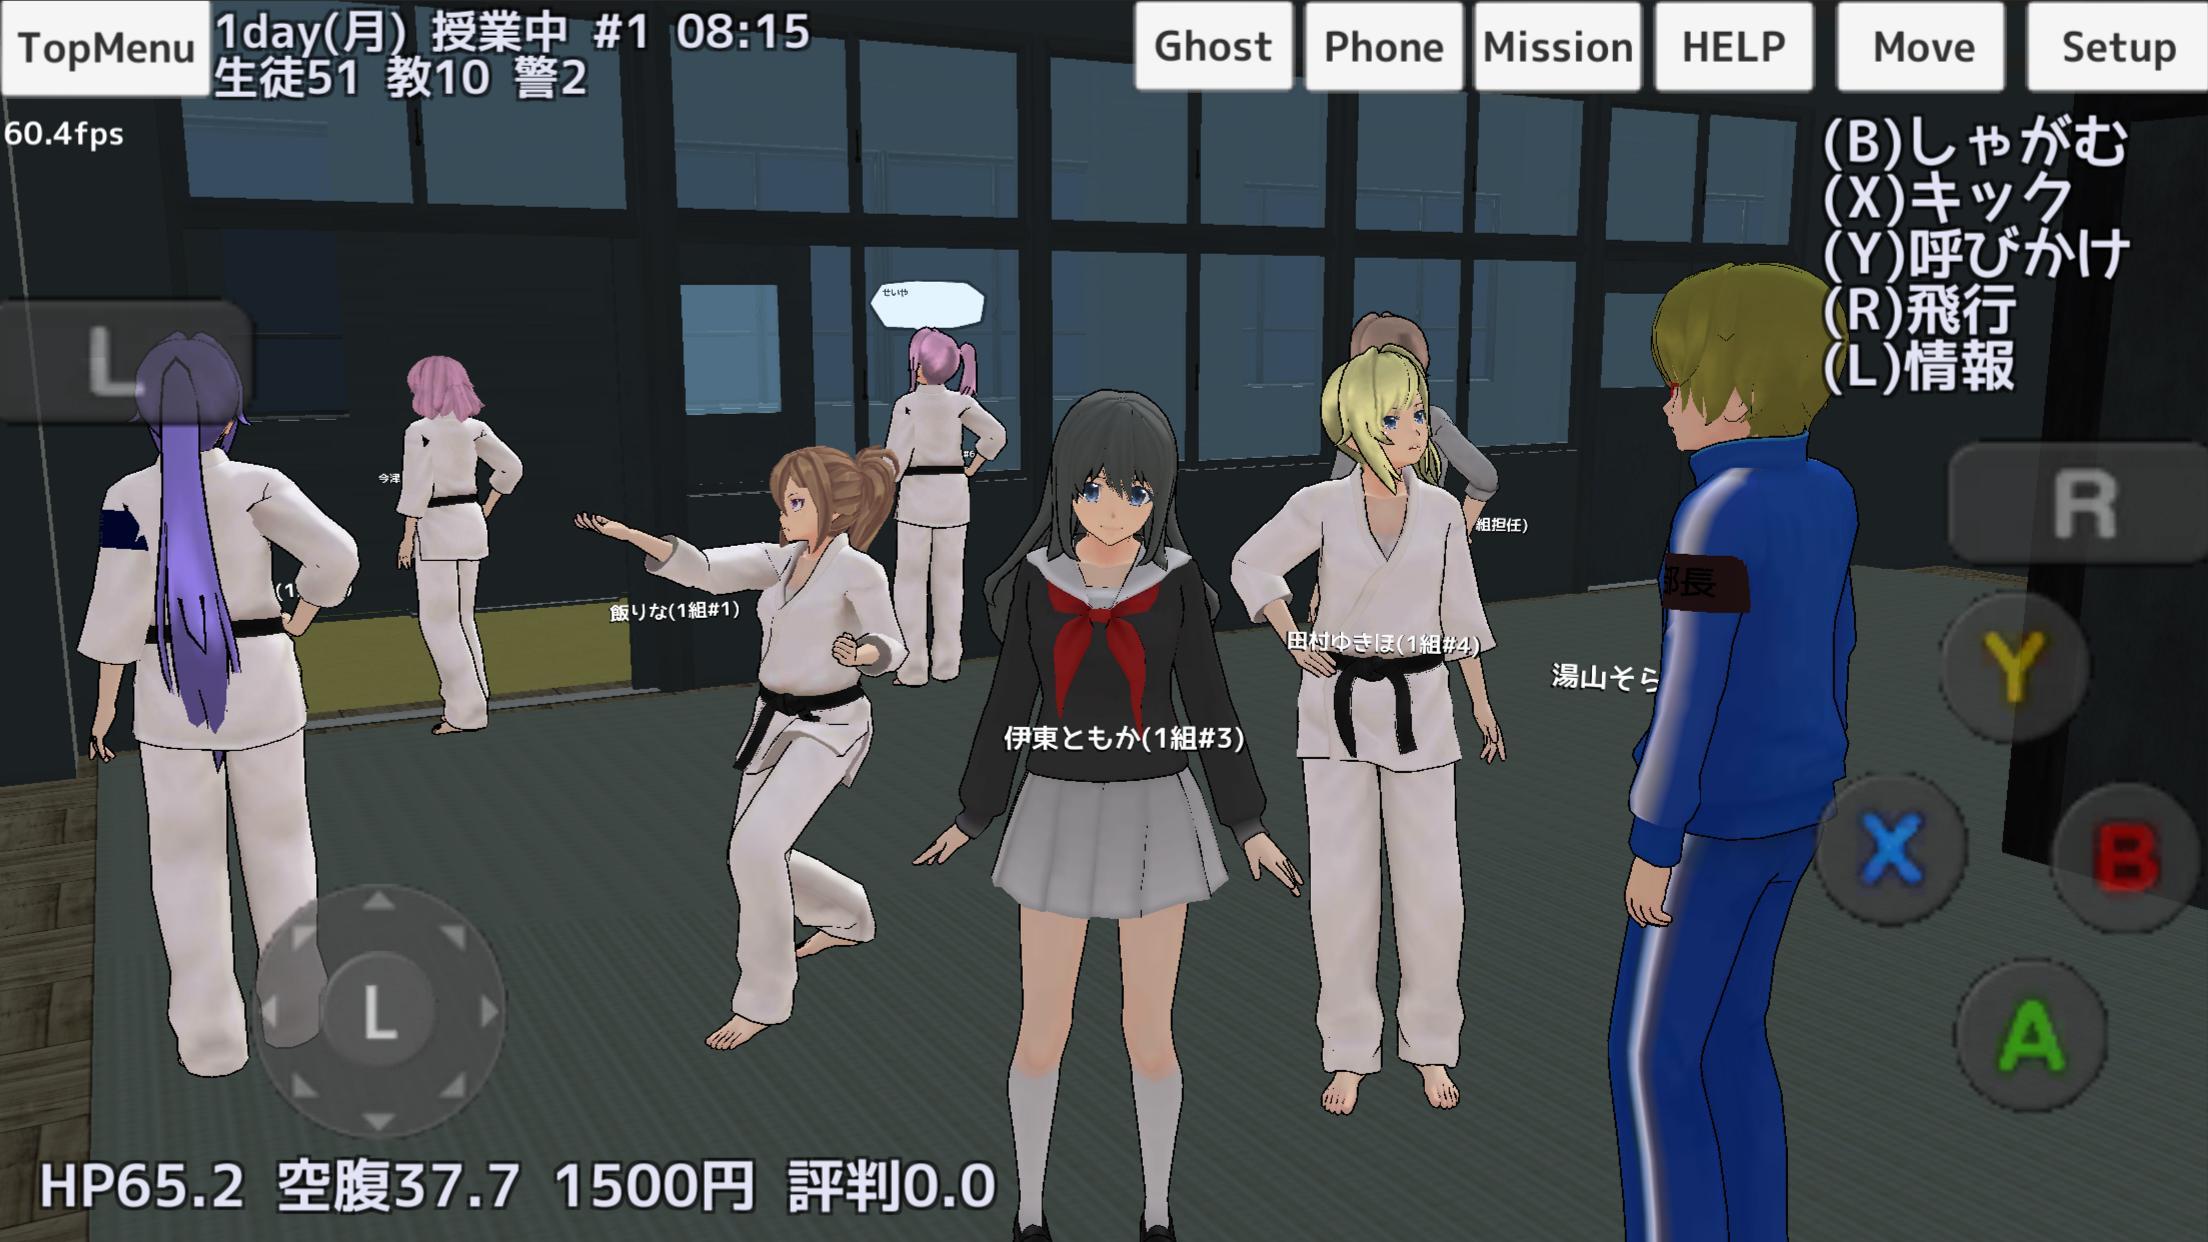 School-Girls-Simulator